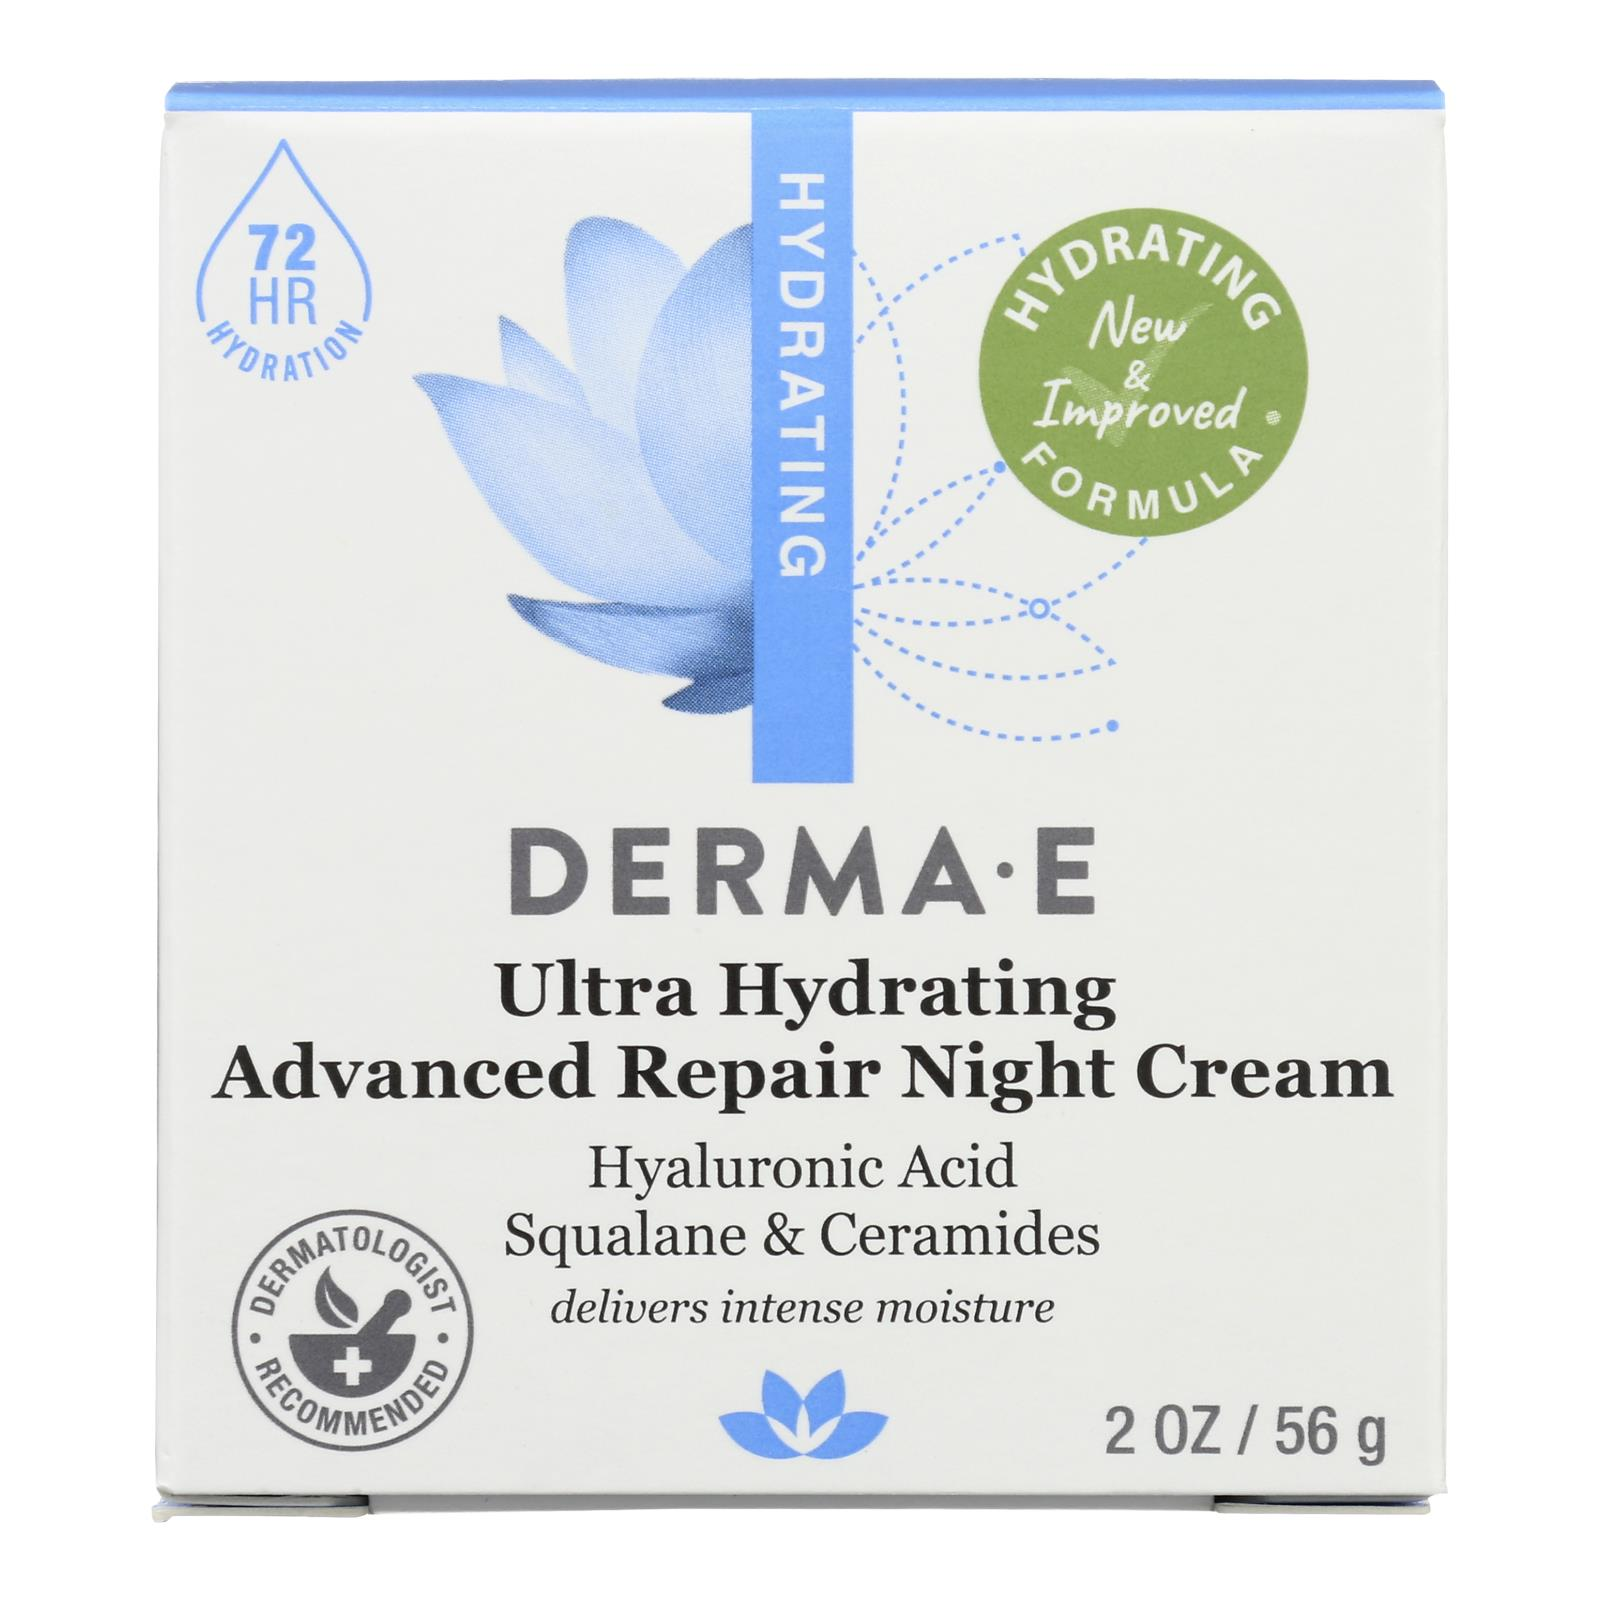 Derma E - Hyaluronic Acid Night Creme - 2 oz.